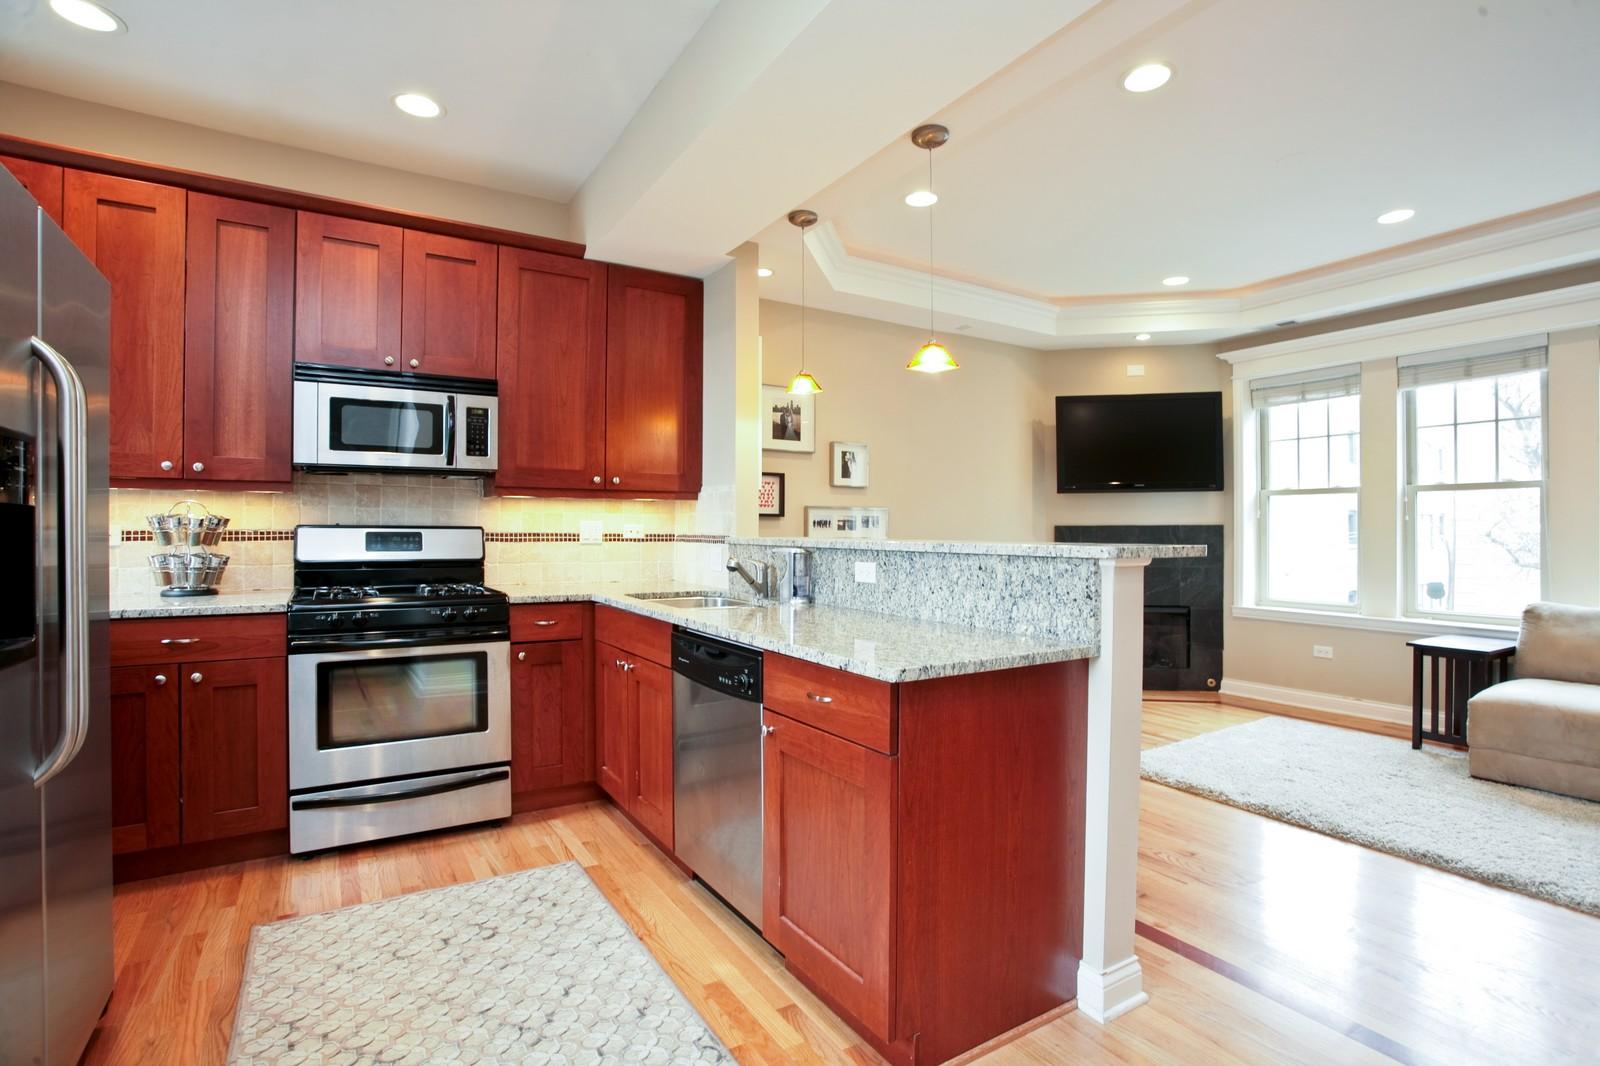 Real Estate Photography - 2646 W Gunnison St, Unit 2, Chicago, IL, 60625 - Kitchen